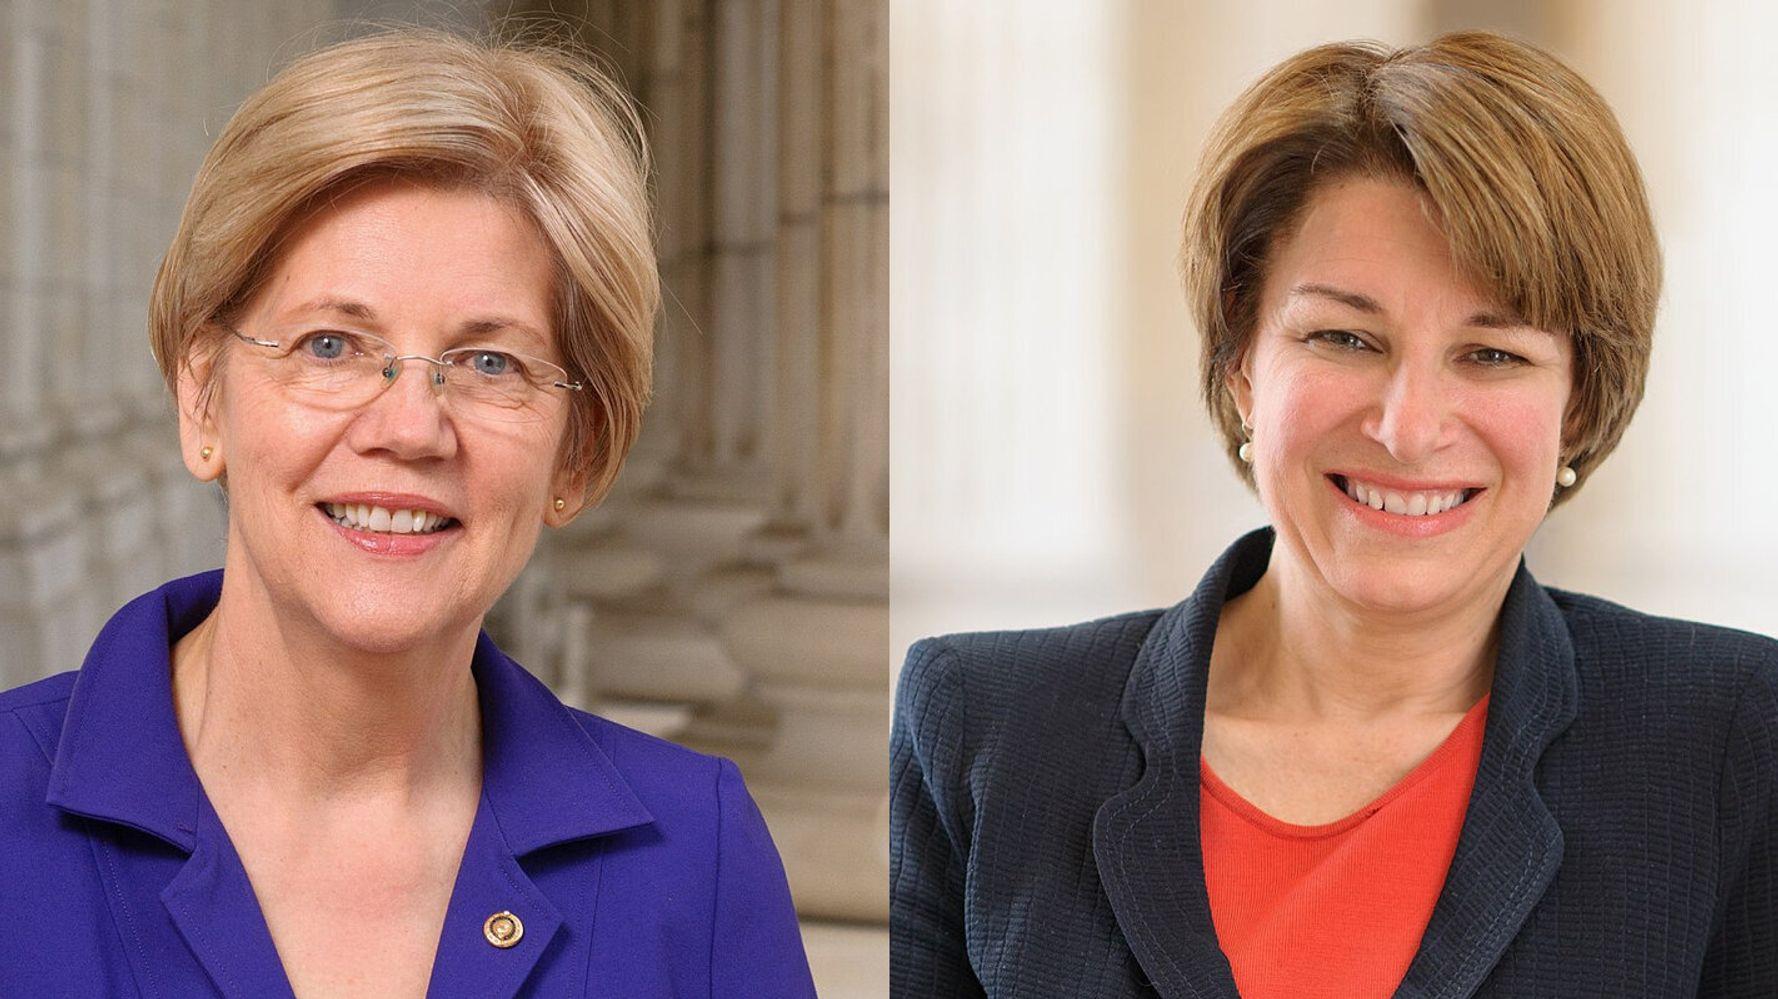 Westlake Legal Group 5e25278b220000d3063f7c60 The New York Times Endorses Elizabeth Warren And Amy Klobuchar